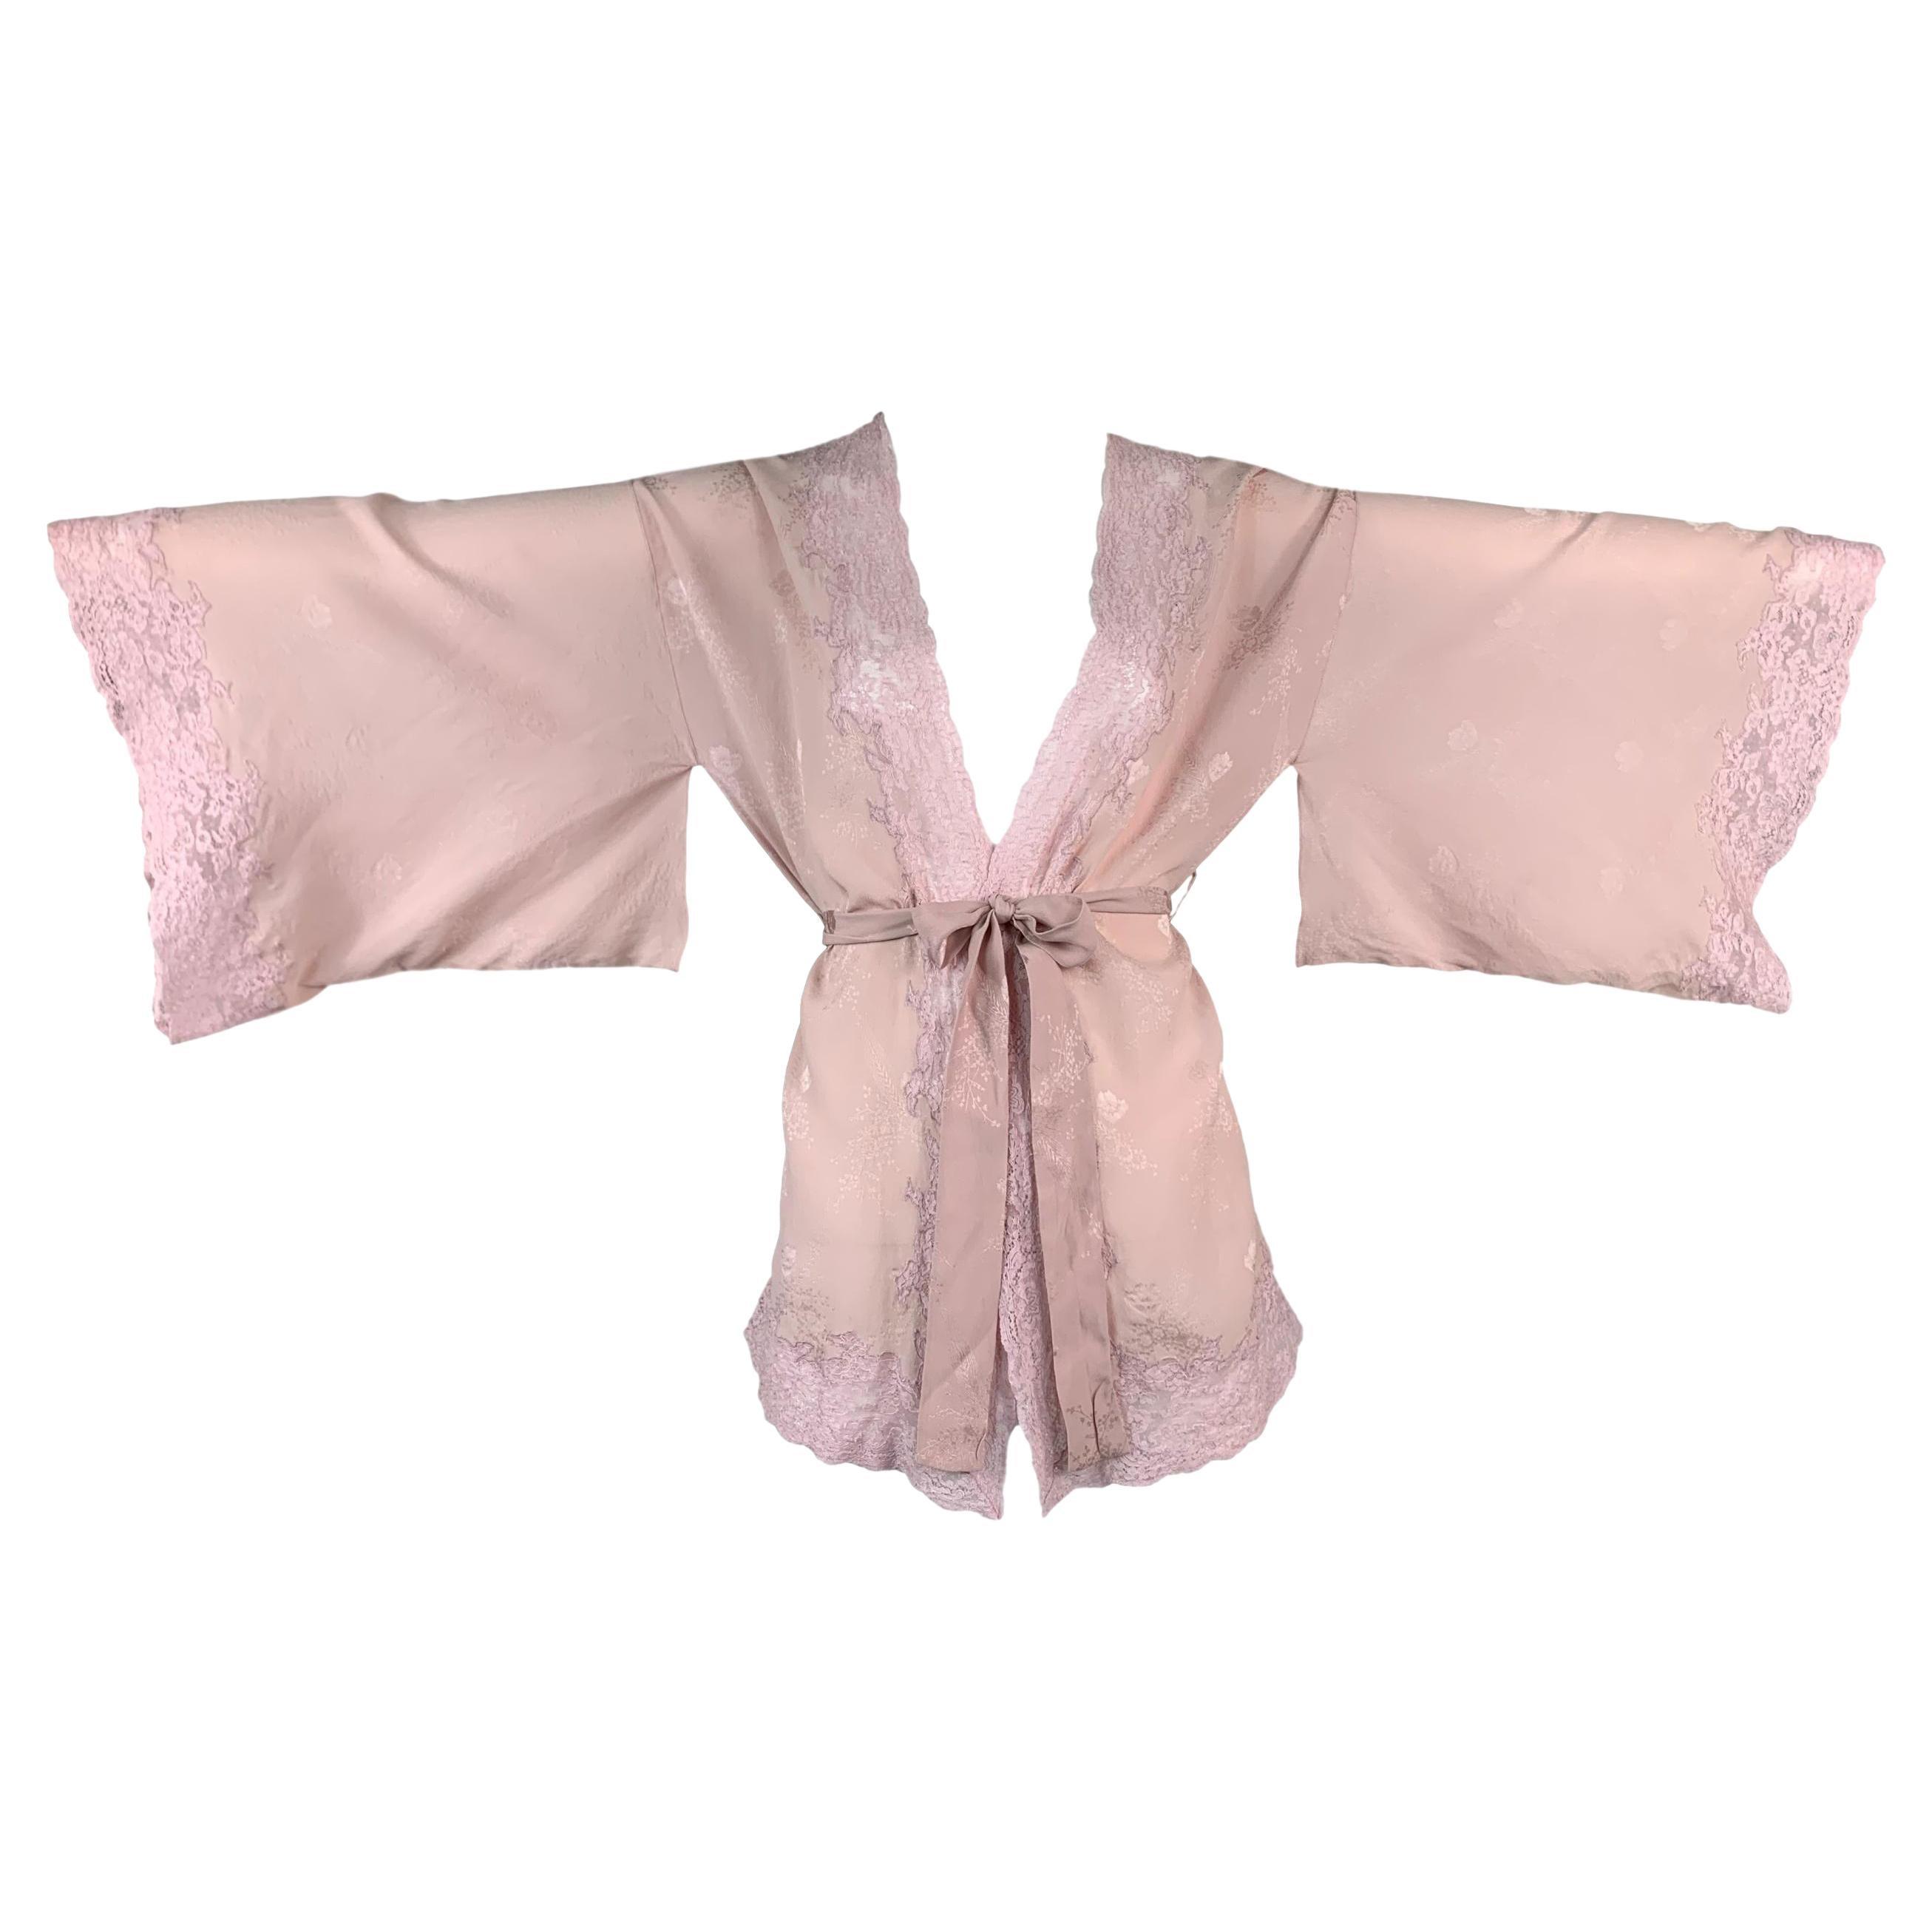 F/W 1998 Christian Dior by John Galliano Pink Silk & Lace Kimono Top